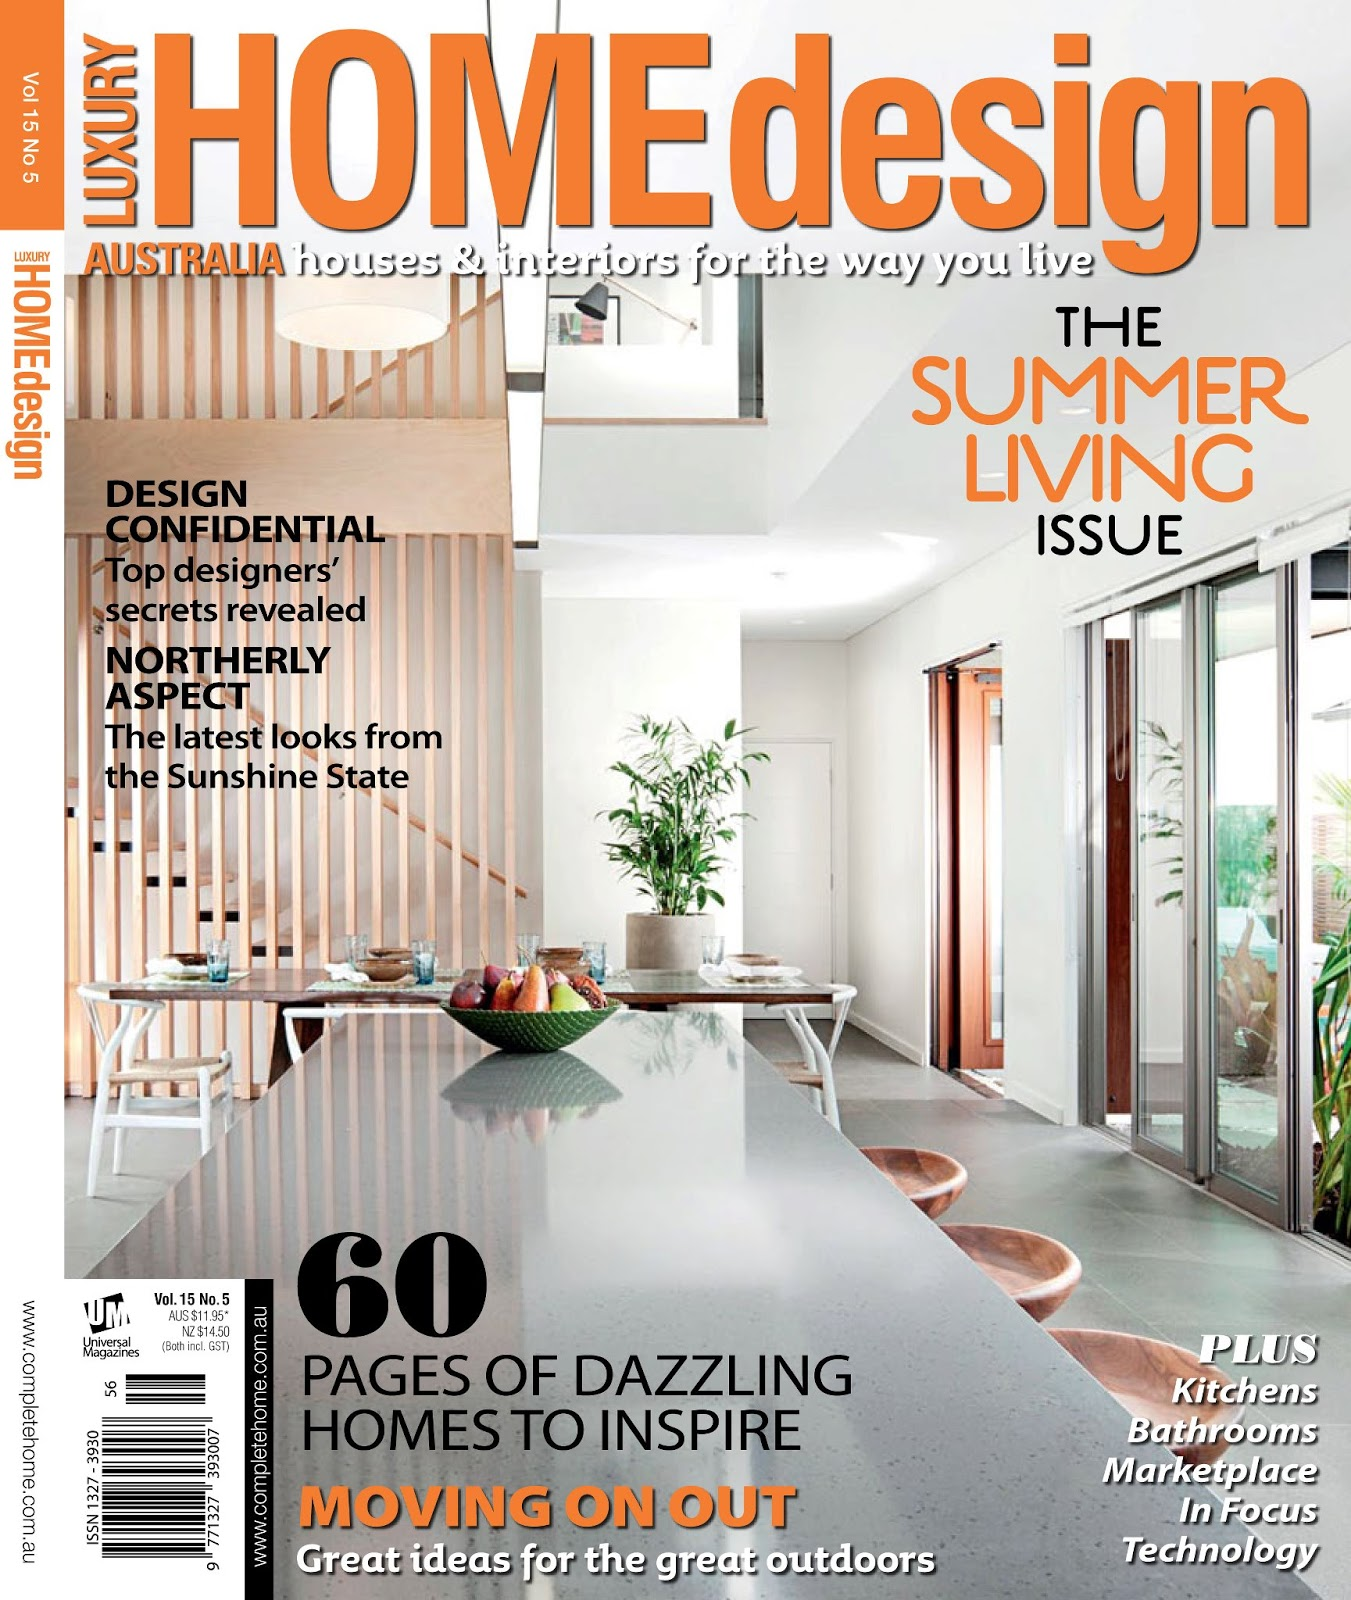 Http Dreamshomesdesign Blogspot Com 2015 03 01 Archive Html